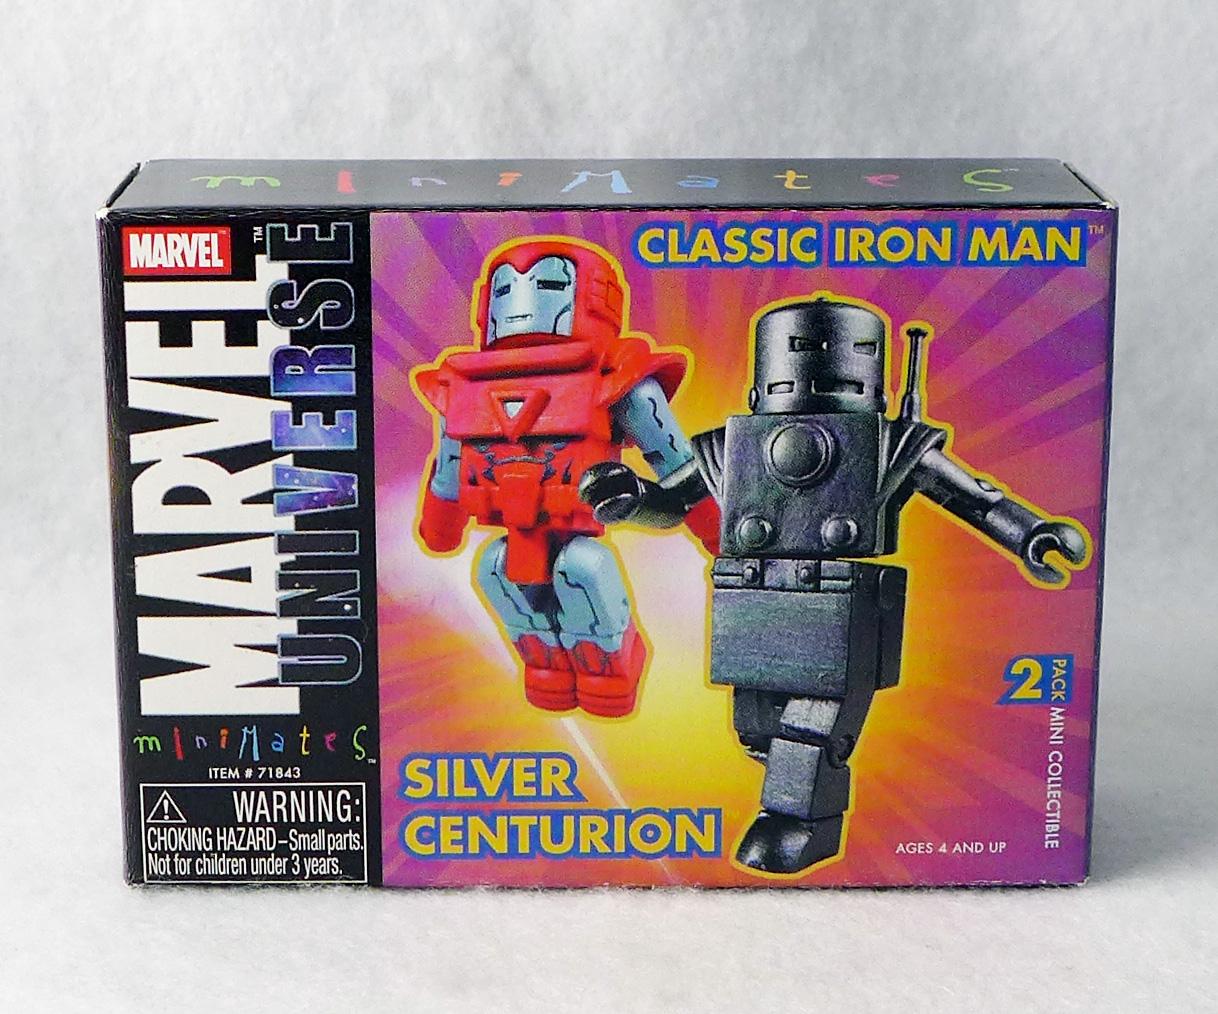 Classic Iron Man & Silver Centurion 2004 AFX Marvel Minimates Exclusive